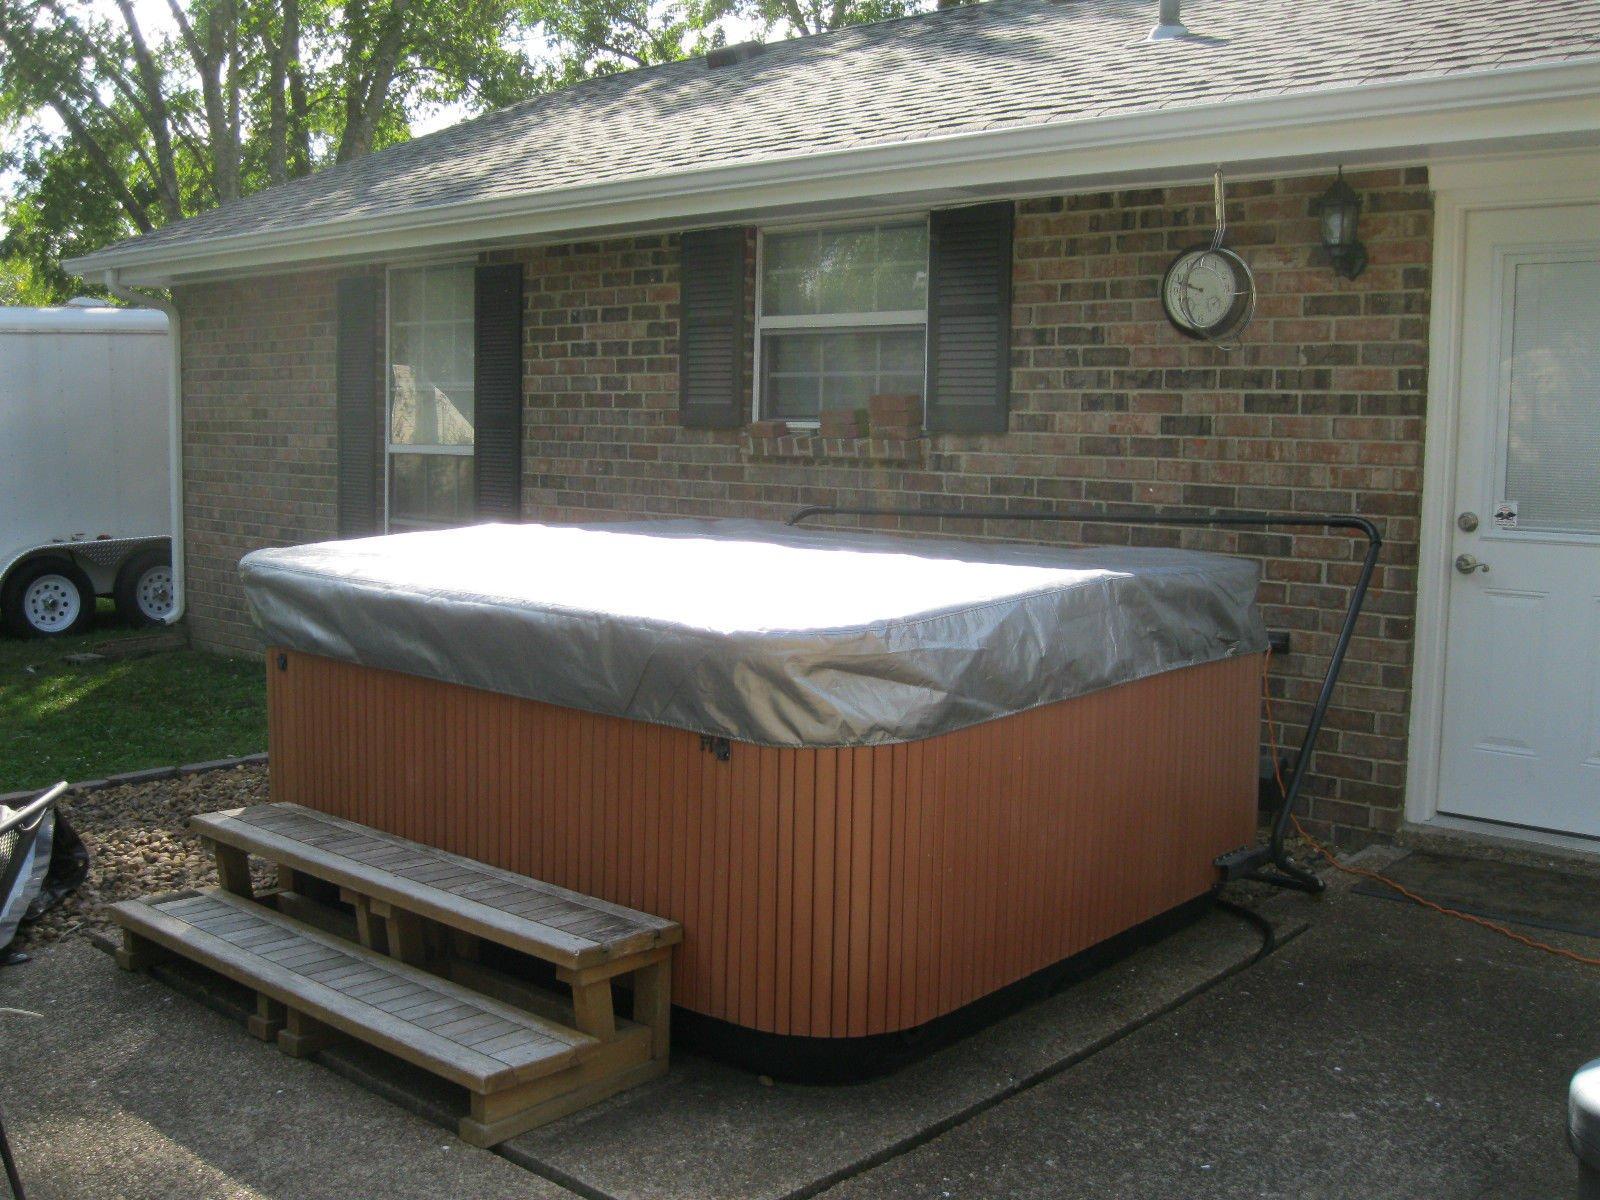 Spa Hot Tub Cover Cap SunShield Fits JACUZZI J Premium 84 x 84 Protector Video